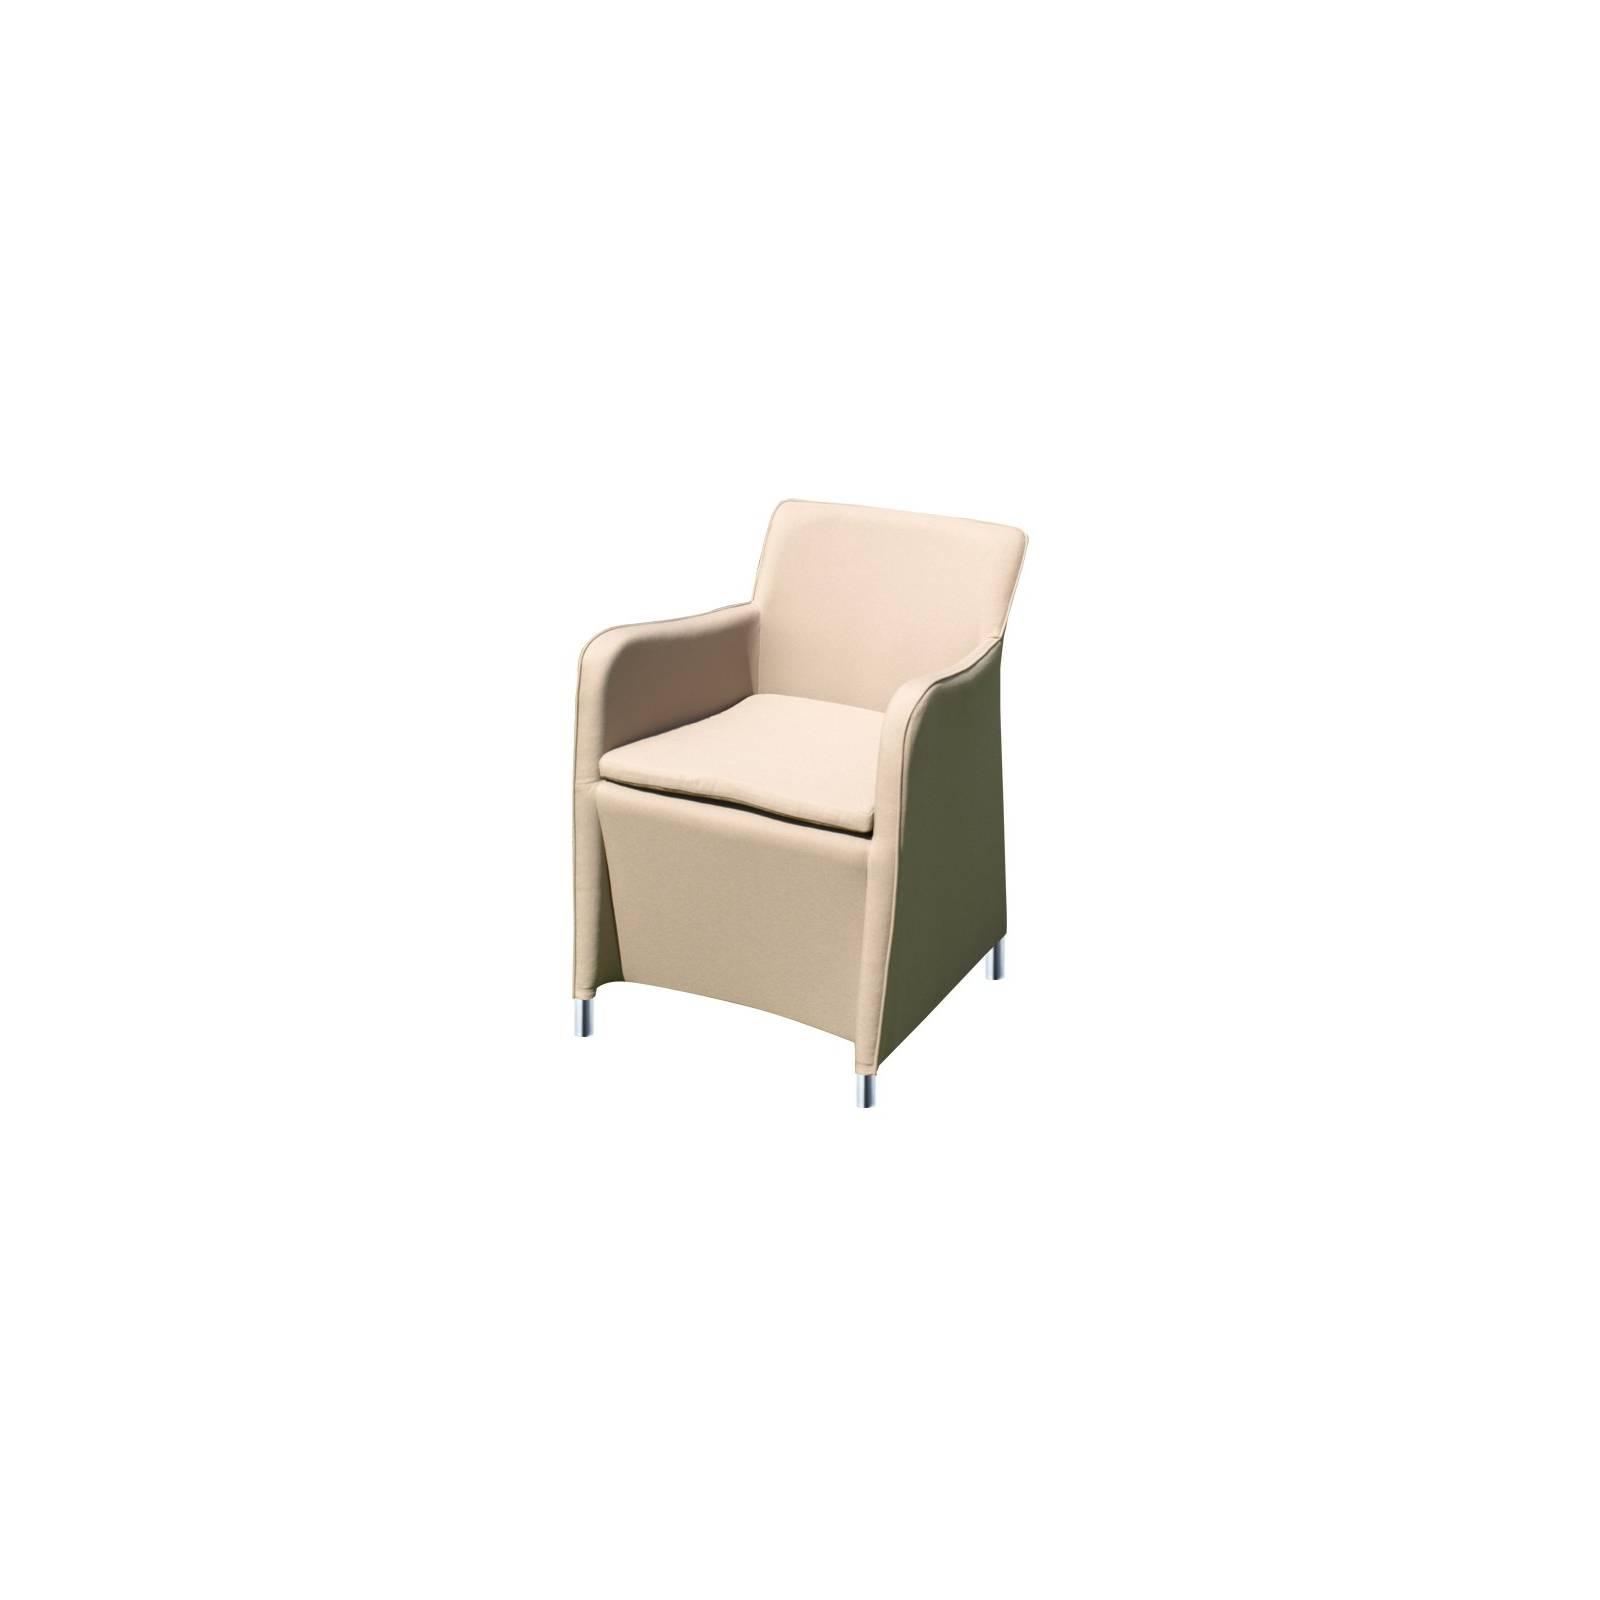 Fauteuil Xenia Tissu - fauteuil design